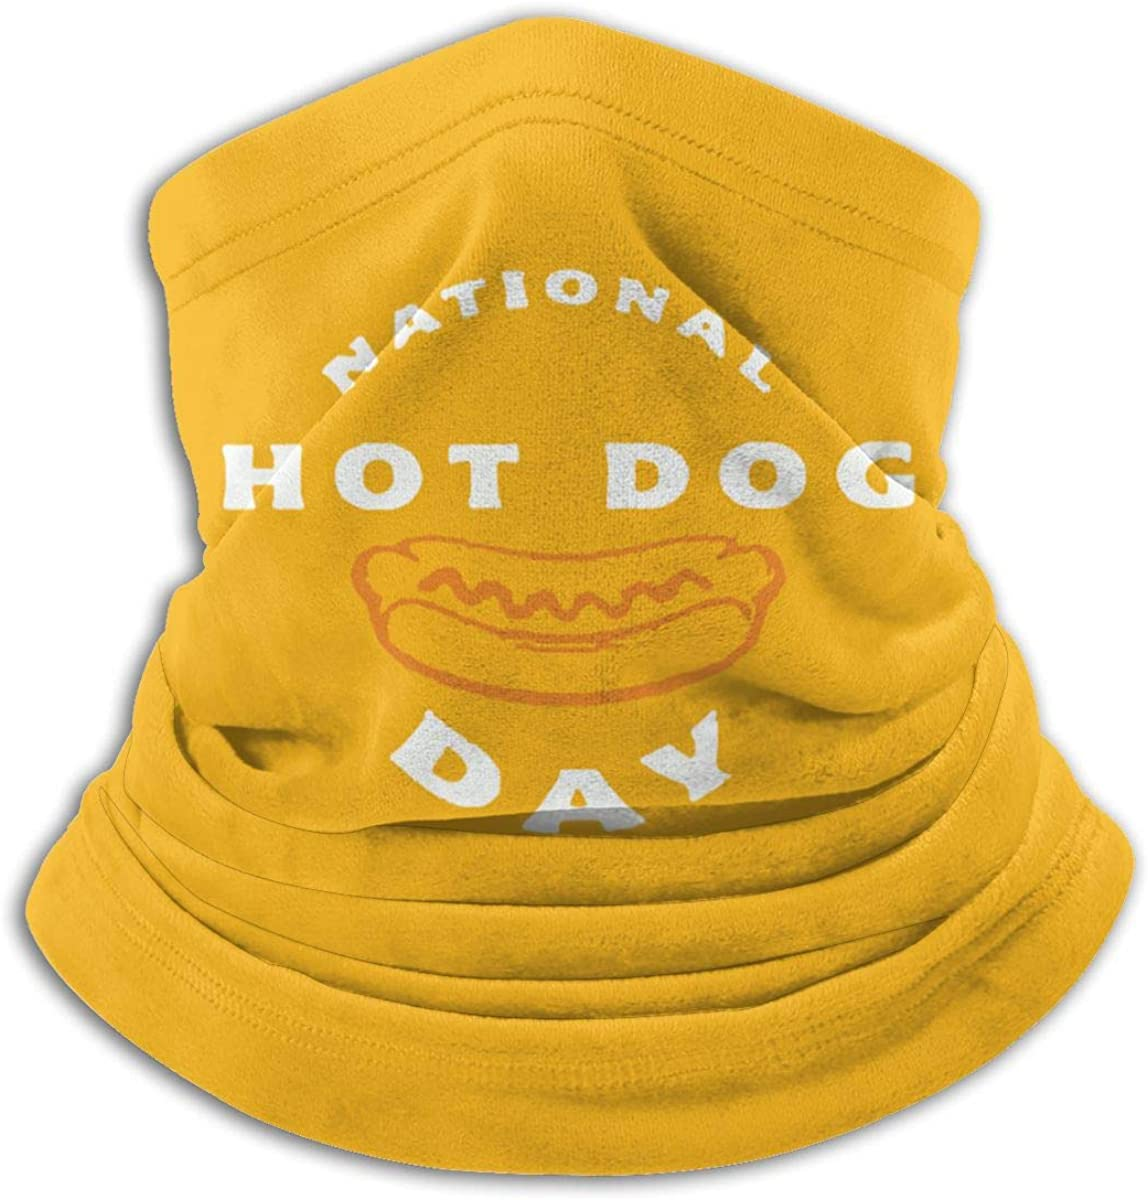 National Hot Dog Day9 Black Multi-function Neck Warmer Gaiter Polyester Neck Warmer Windproof Winter Neck Gaiter Cold Weather Scarf For Men Women